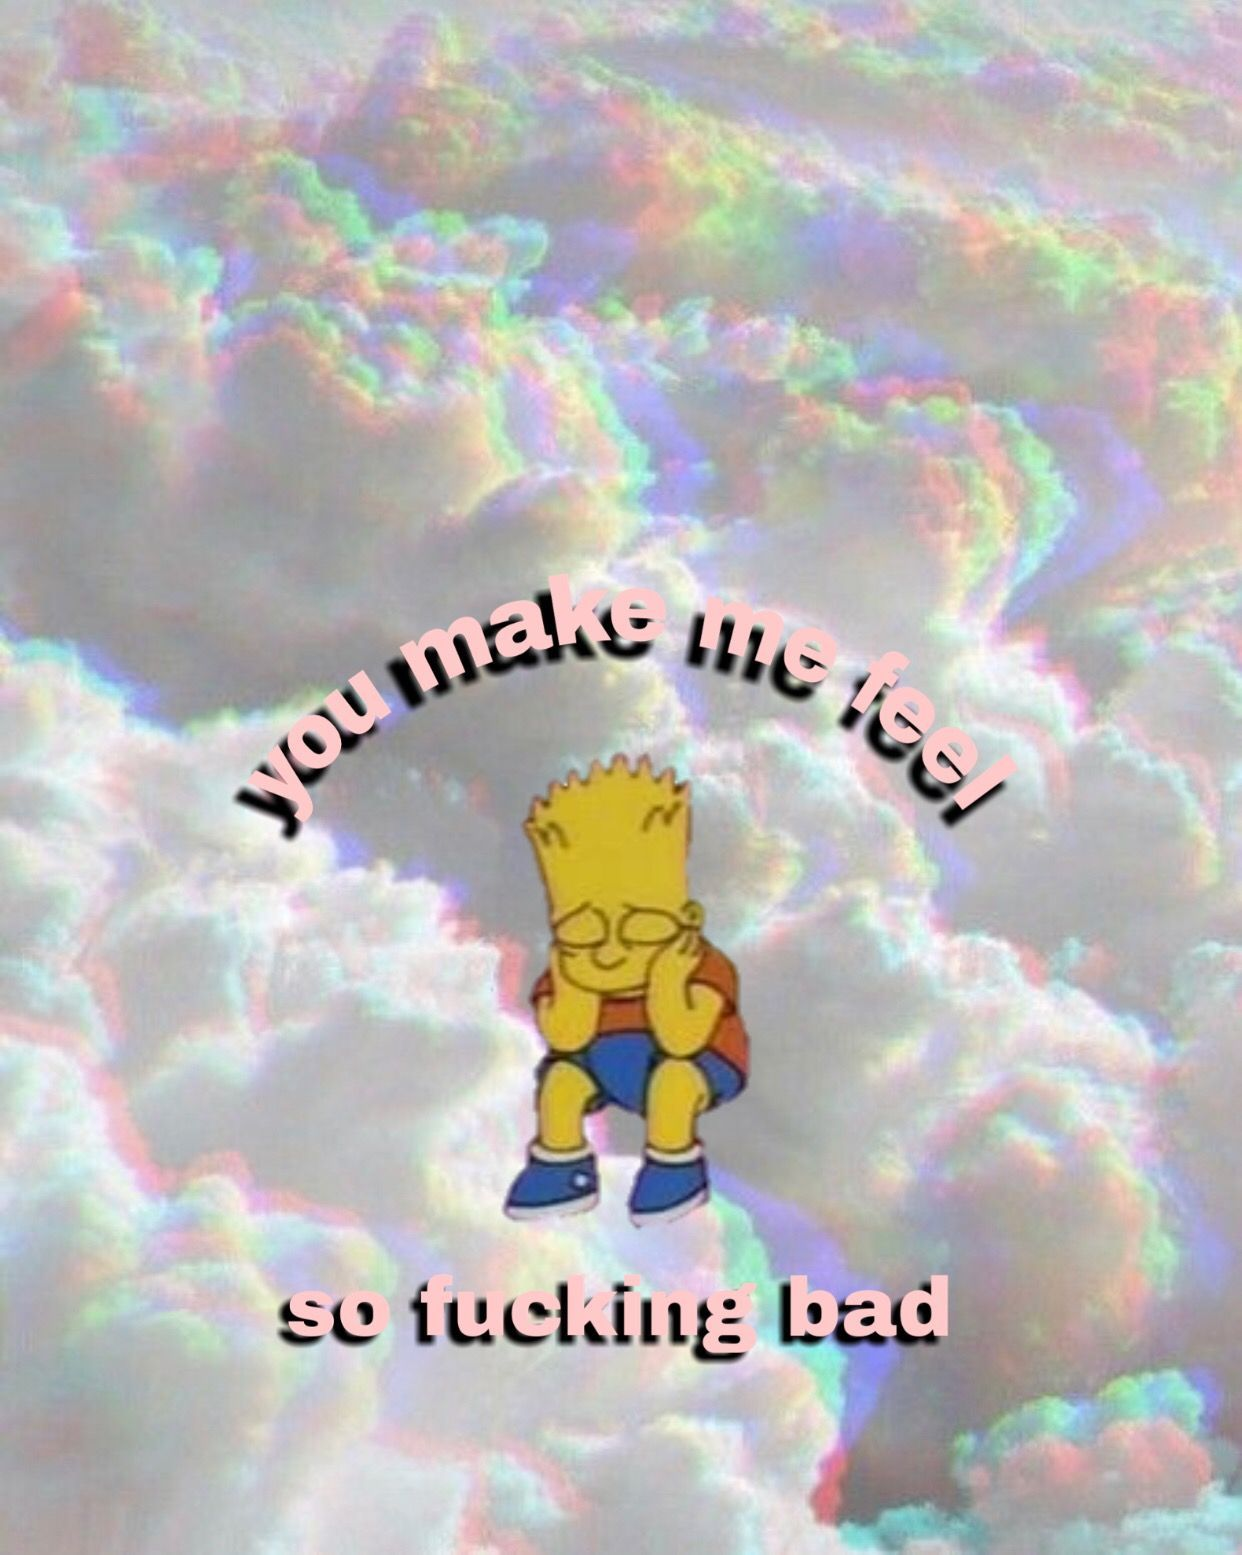 Sad Simpsons Wallpapers On Wallpaperdog